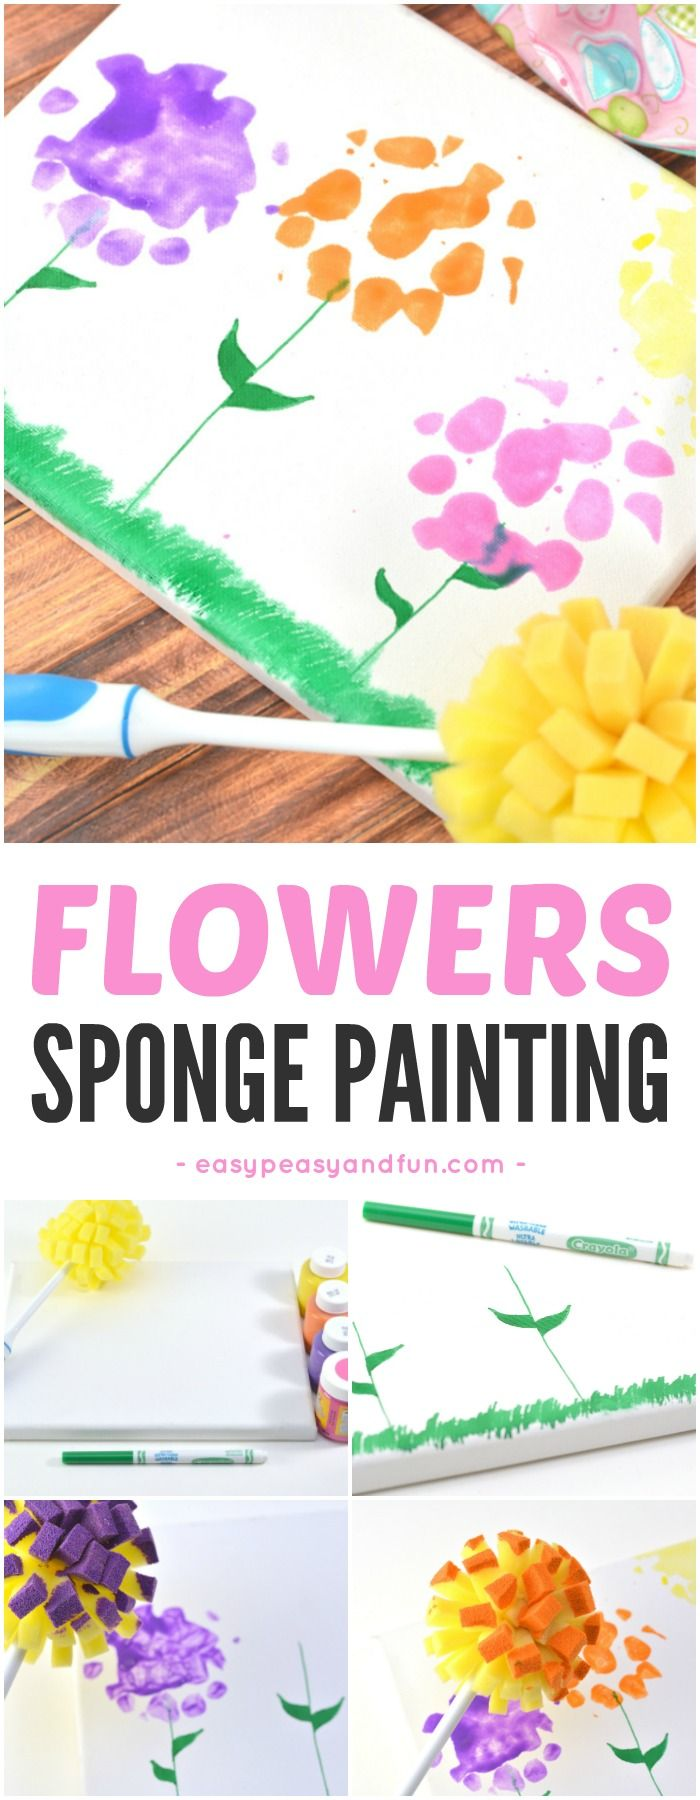 Spring Flowers Sponge Painting Canvas Art Idea for Kids #canvasart #paintingforkids #springcraftsforkids